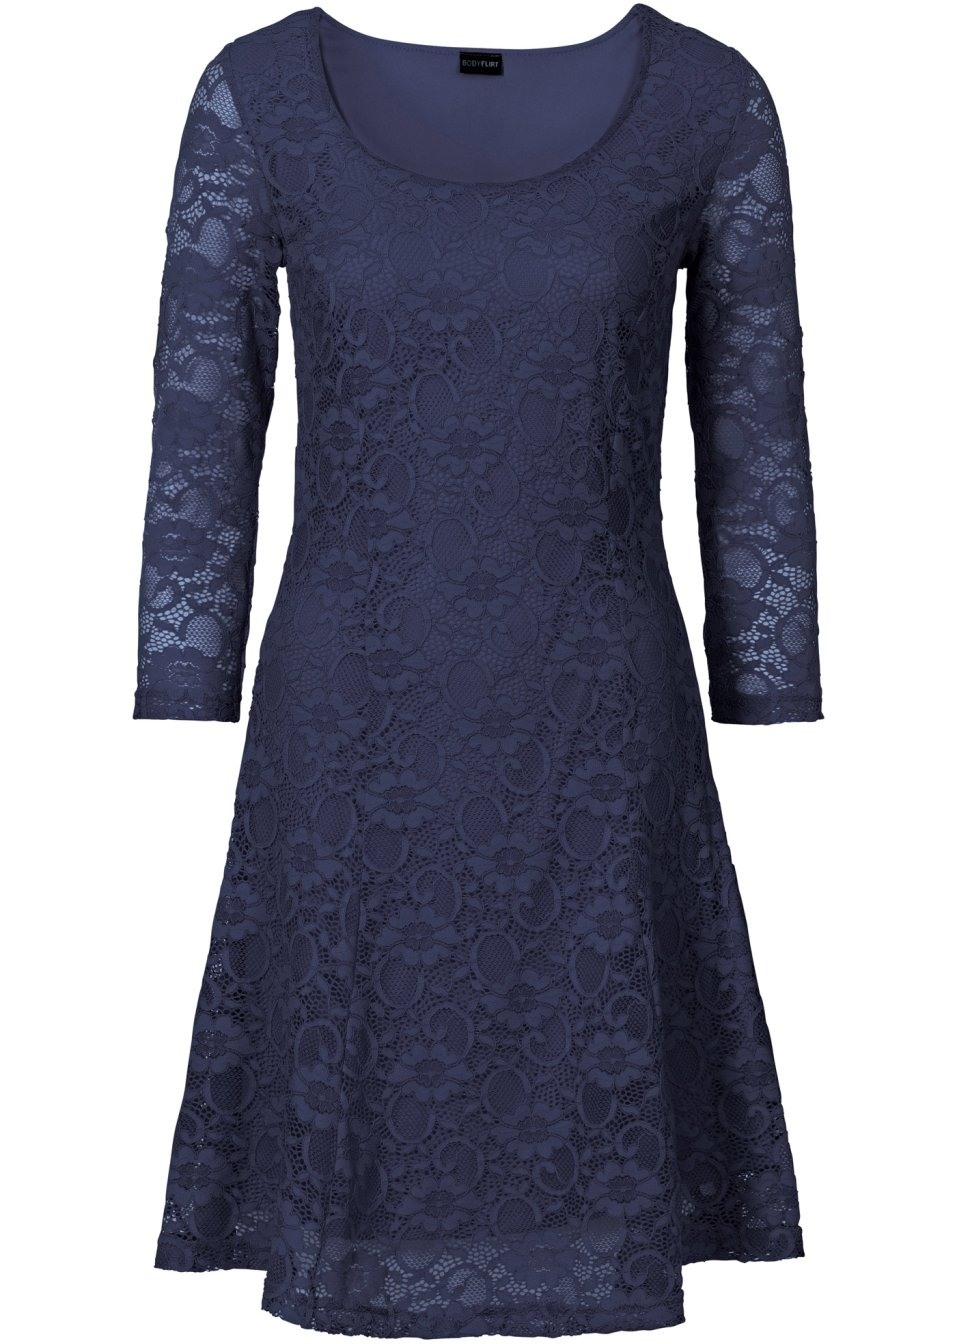 13 Elegant Kleid Dunkelblau Kurz Stylish13 Spektakulär Kleid Dunkelblau Kurz Galerie